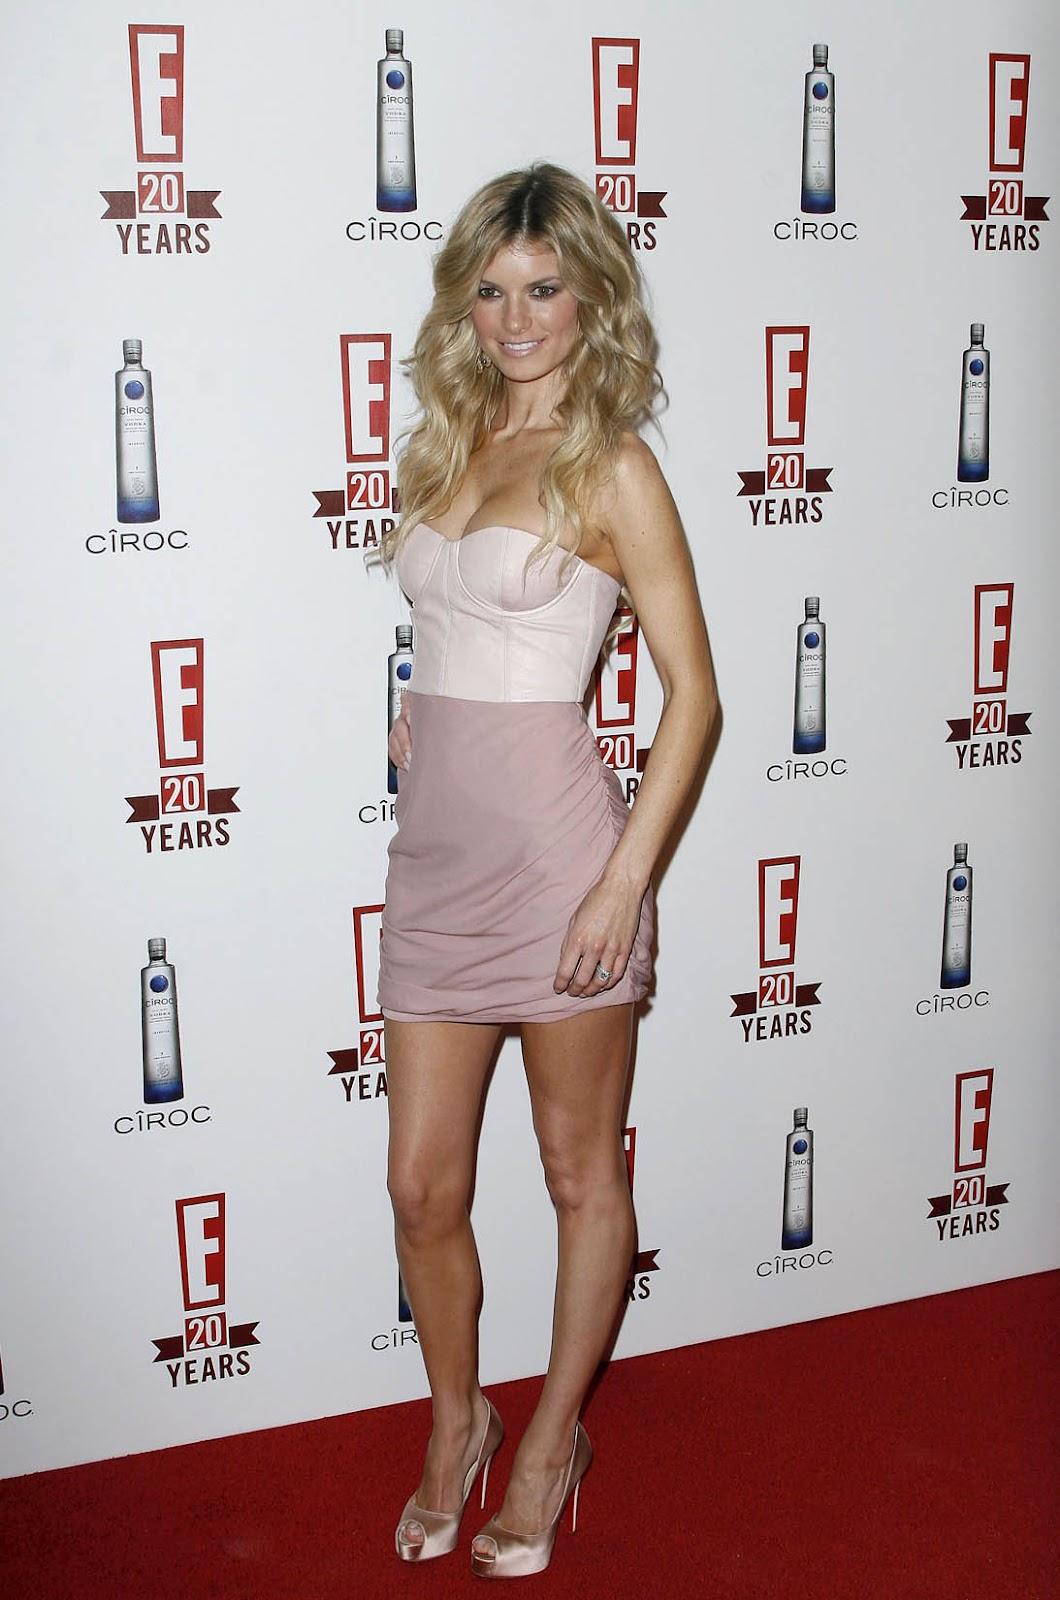 http://4.bp.blogspot.com/-49gHV4oJUto/UGGJxKecBEI/AAAAAAAAE3w/OYDVngl3OQg/s1600/Marisa-Miller-Feet-181523.jpg